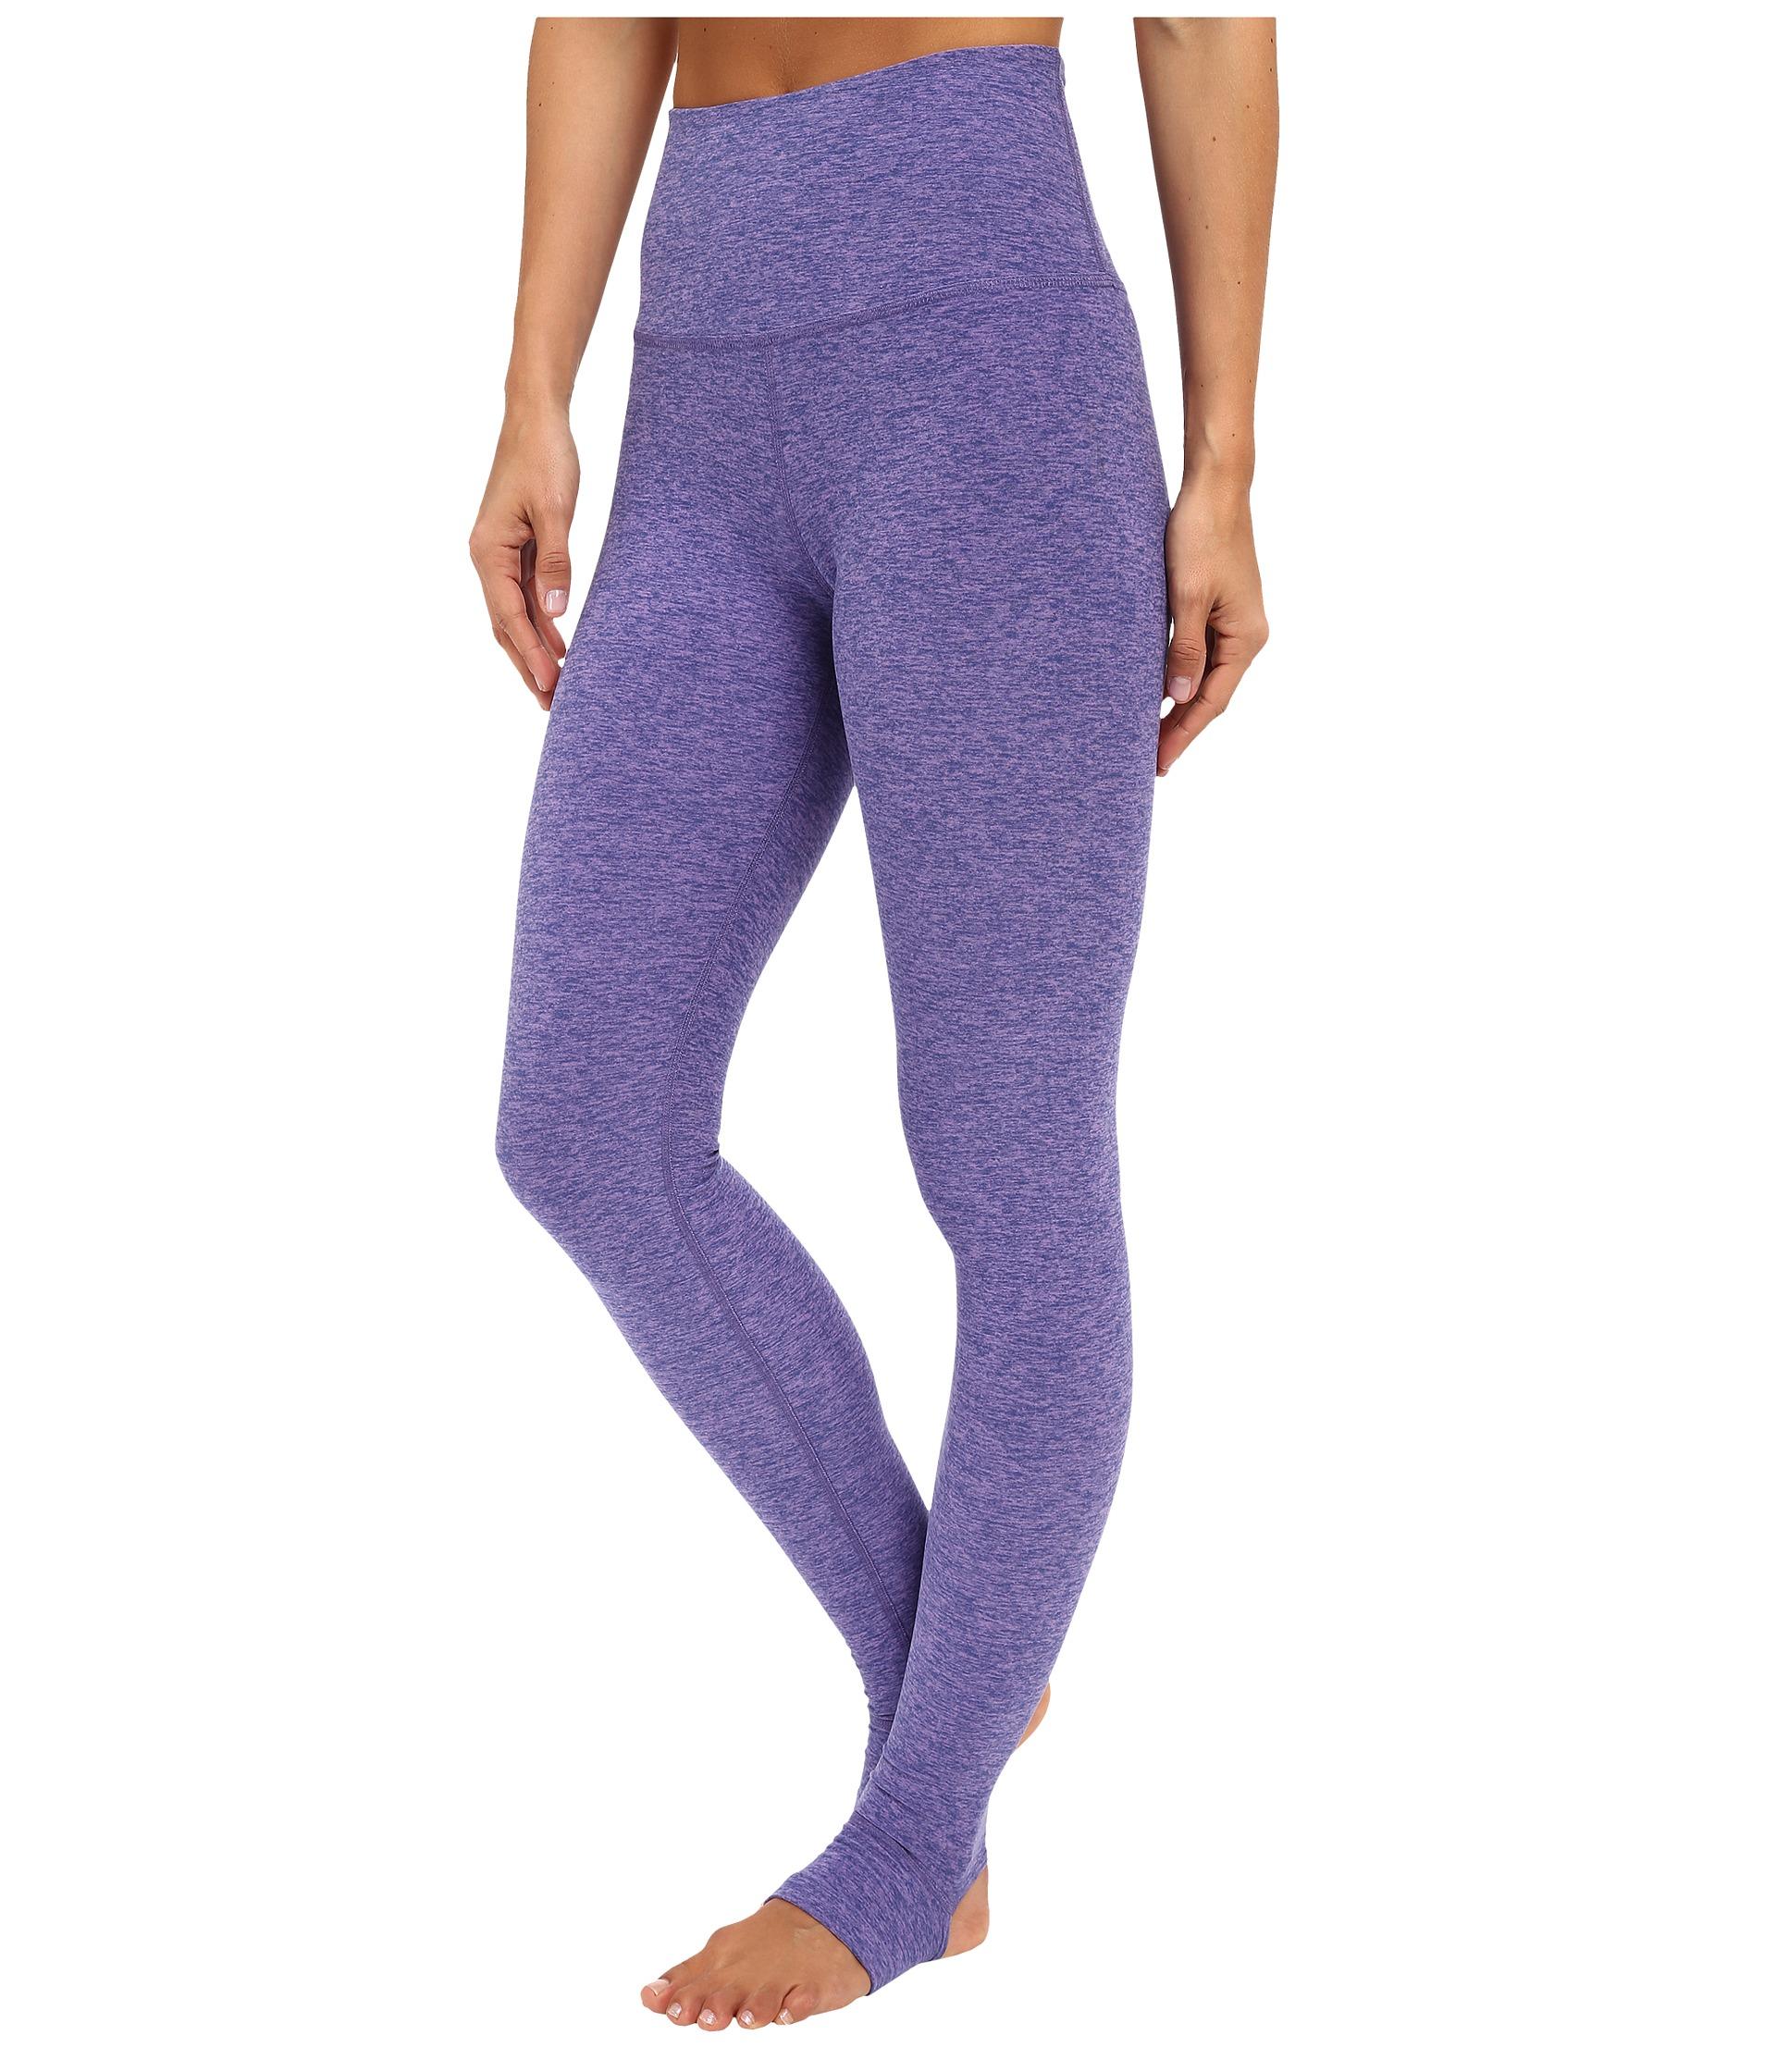 2b57fb7e48075 Beyond Yoga High Waist Stirrup Leggings in Blue - Lyst